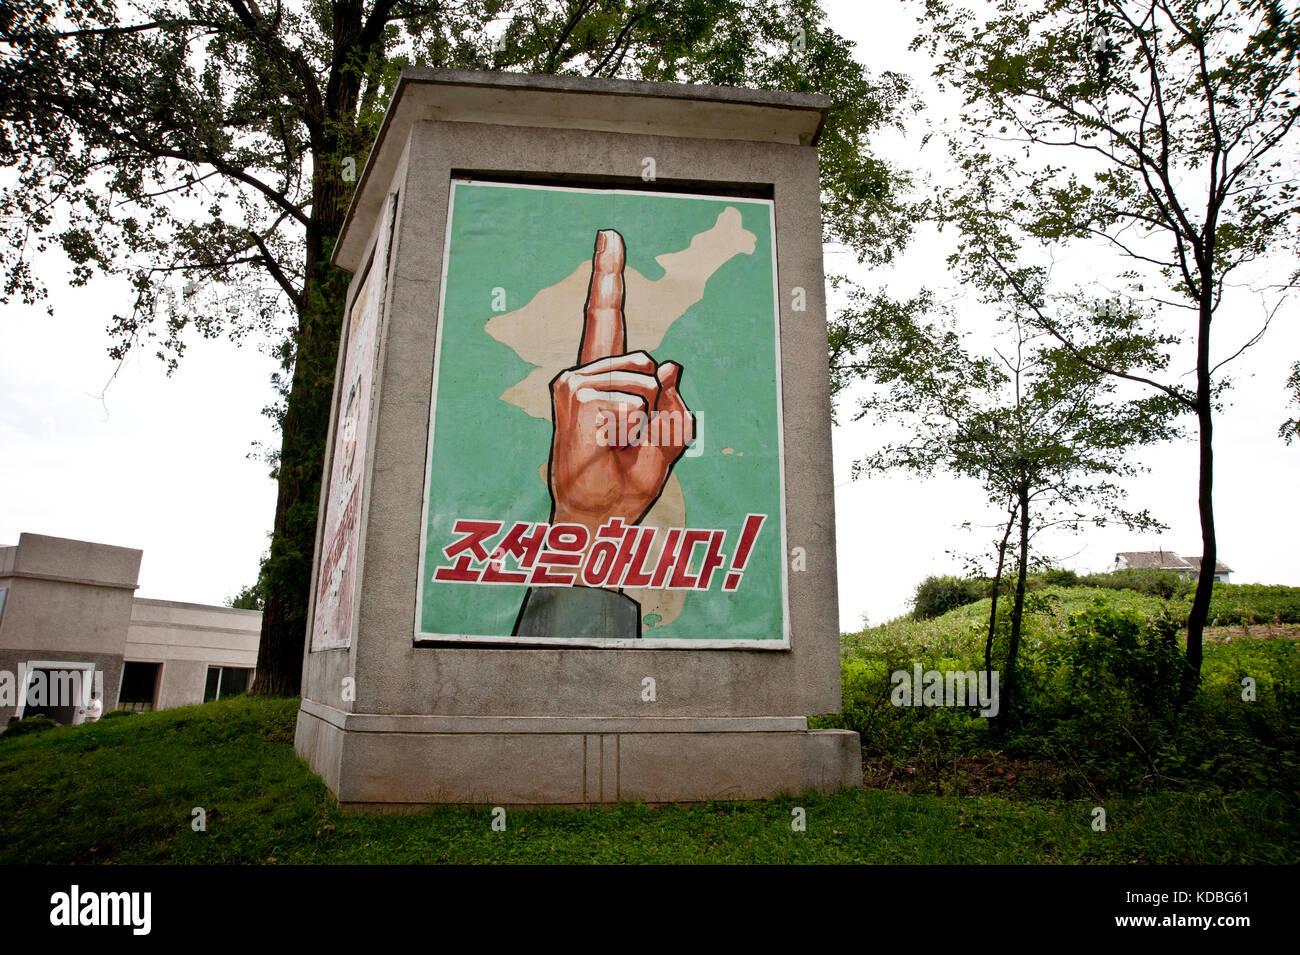 "Symbole fort de Corée du Nord, cette Main est sichtbar Partout. ""Korea ist eine"". starkes Symbol in Nordkorea, diese Stockfoto"